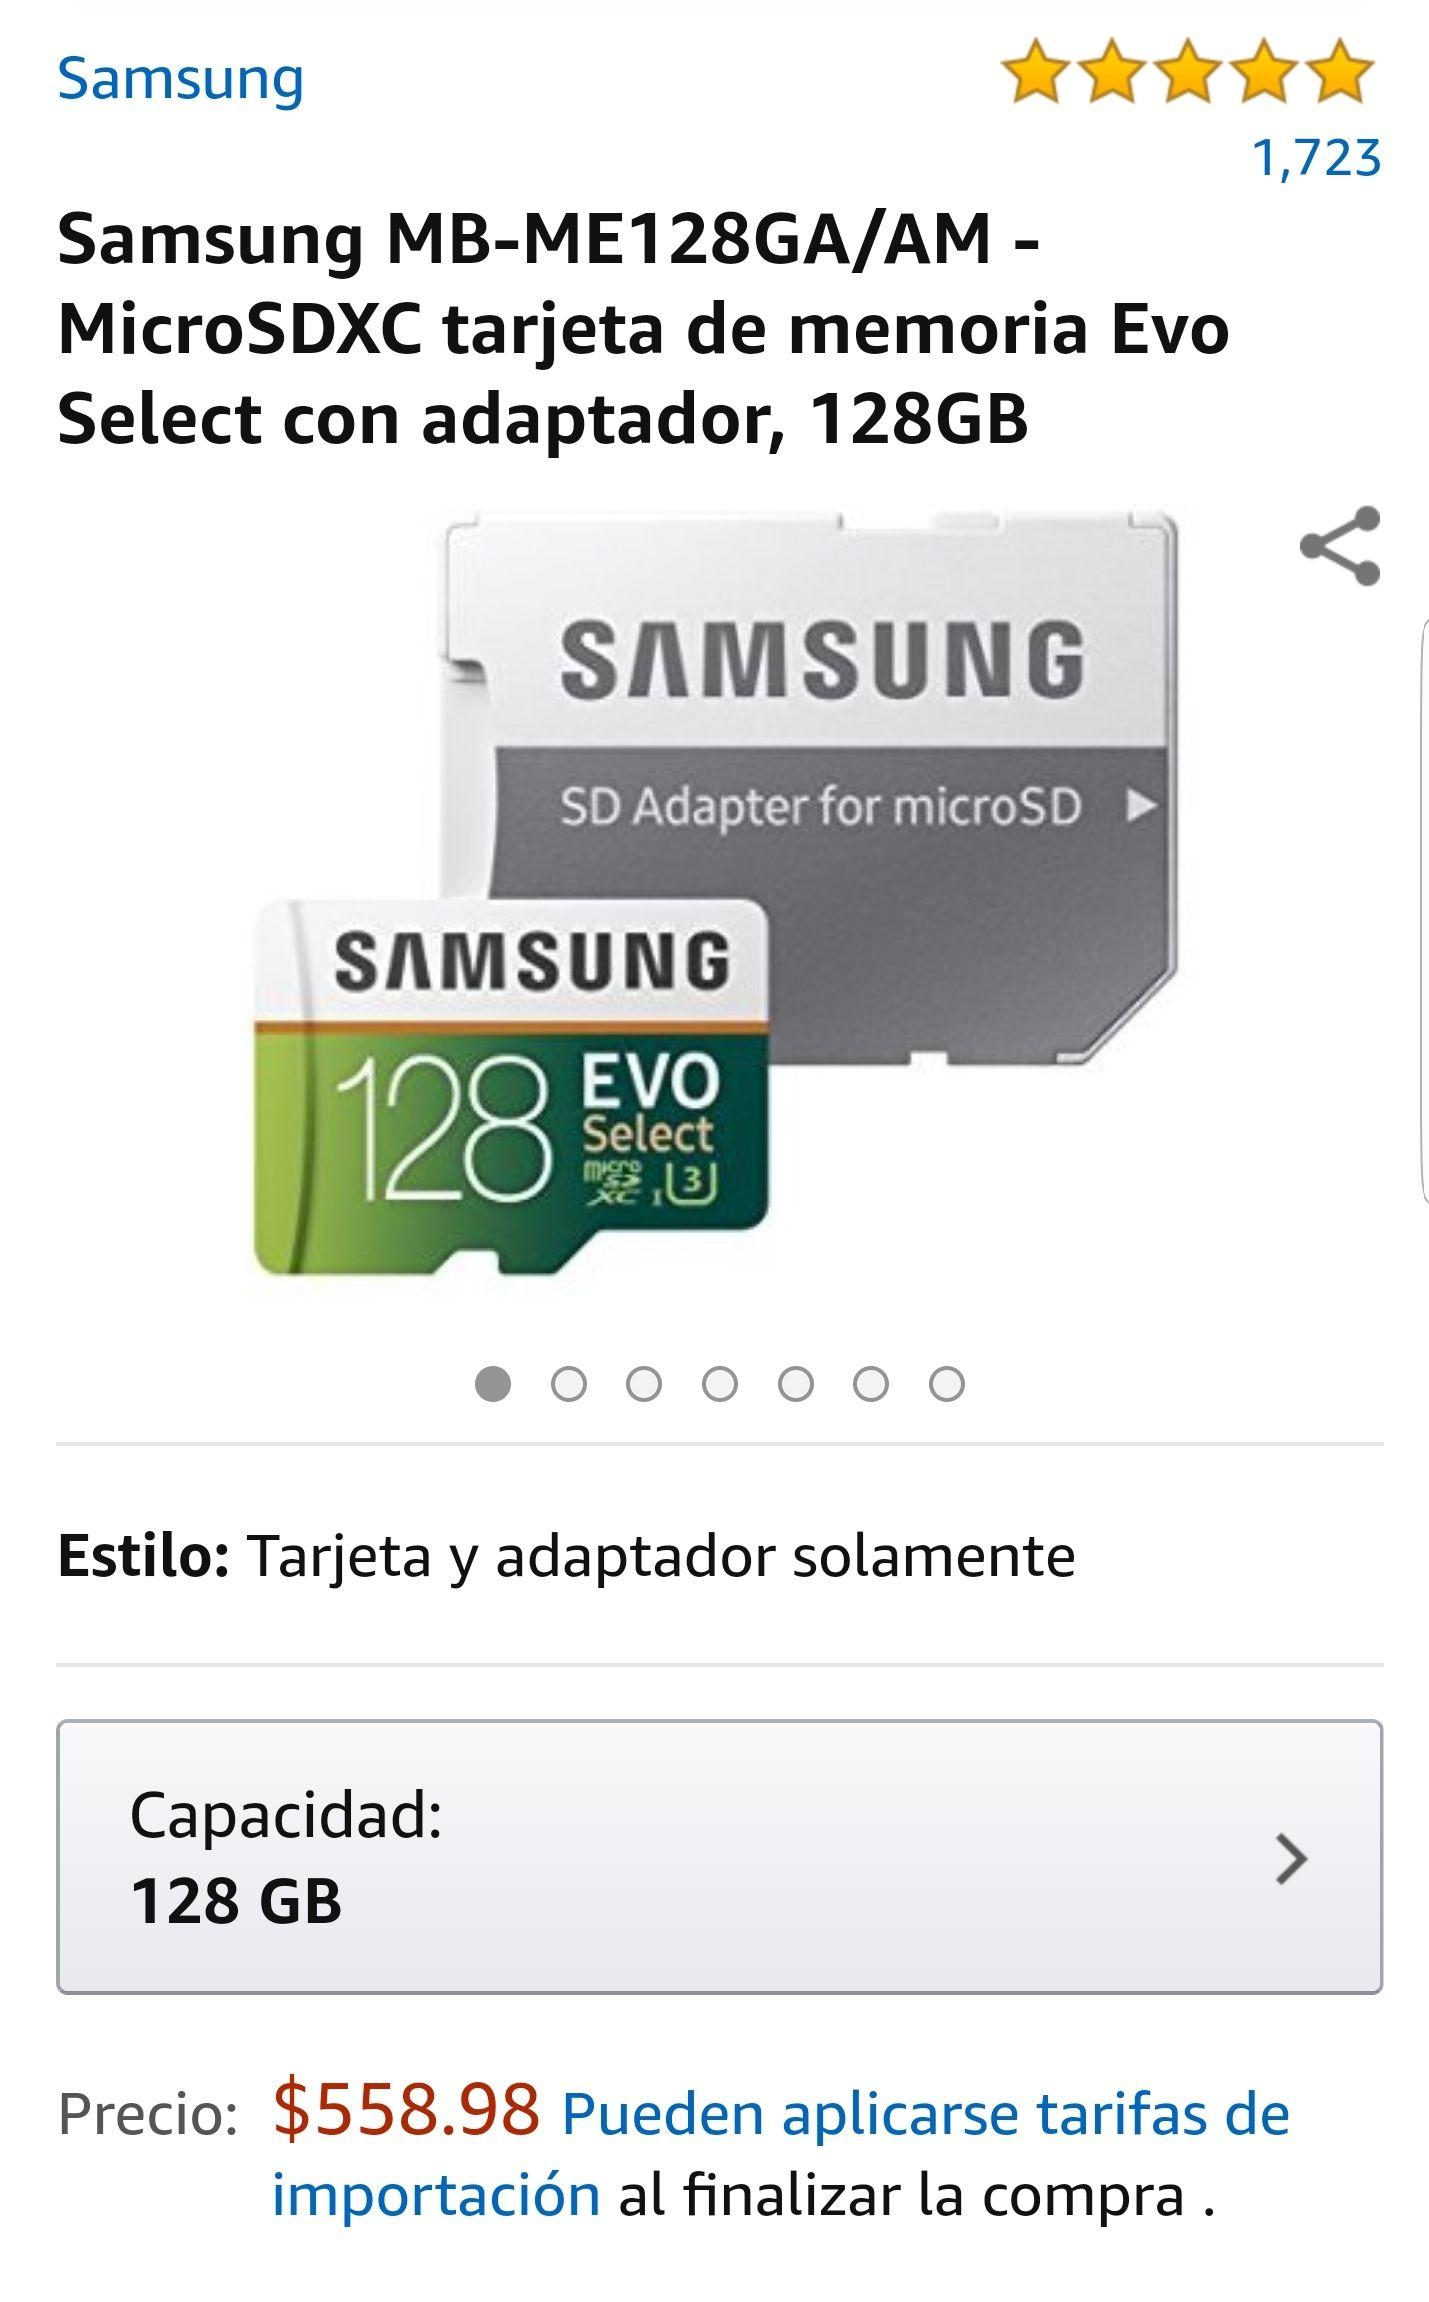 Amazon: Samsung MB-ME128GA/AM MicroSDXC Evo Select  128GB